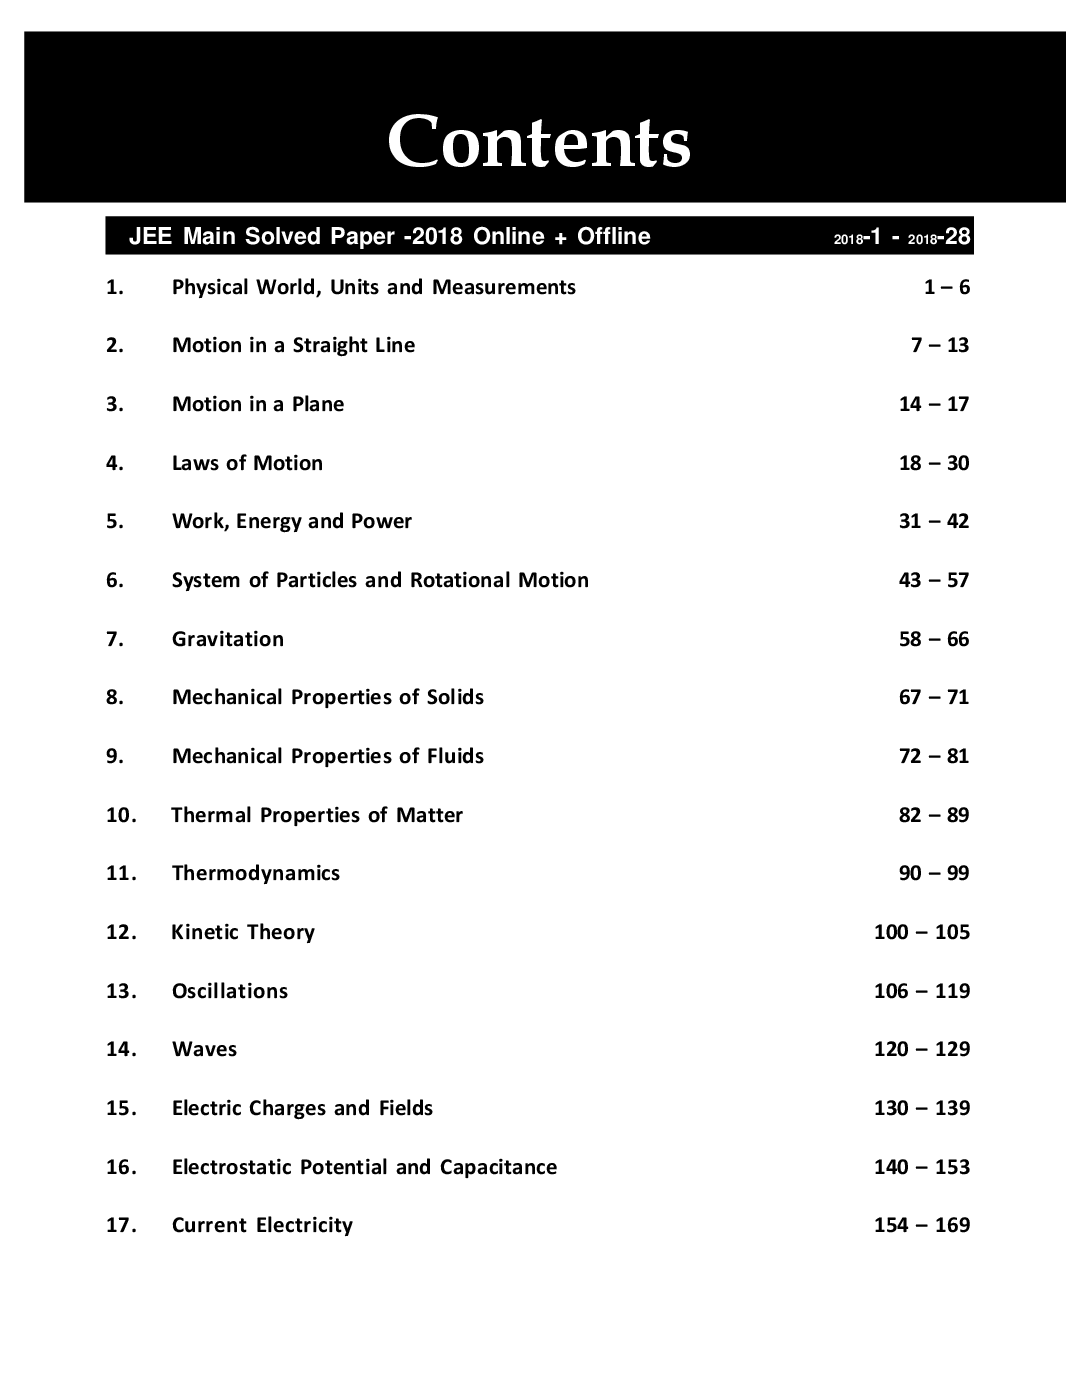 Download 39 JEE Main Physics Online (2018-2012) & Offline